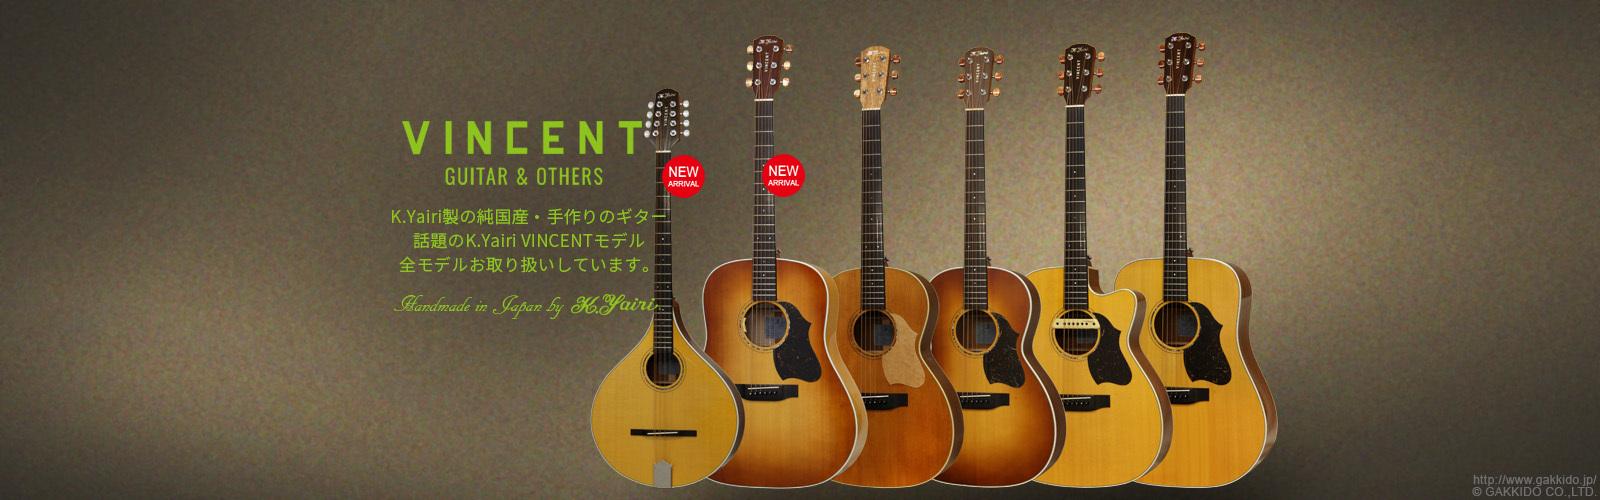 VINCENT -Guitar&Others-